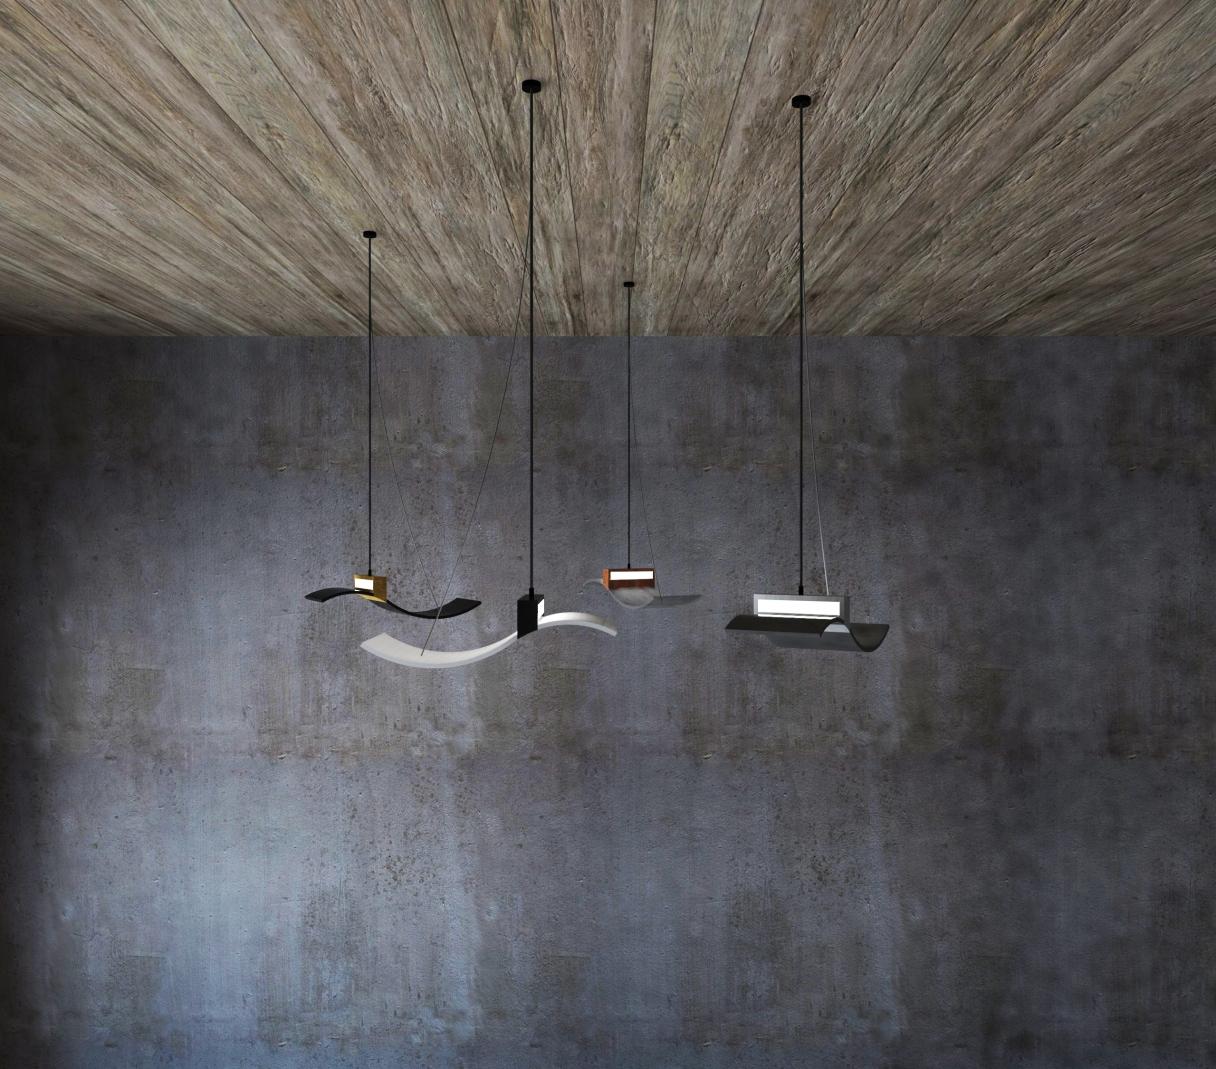 crvd ceiling 1 copy